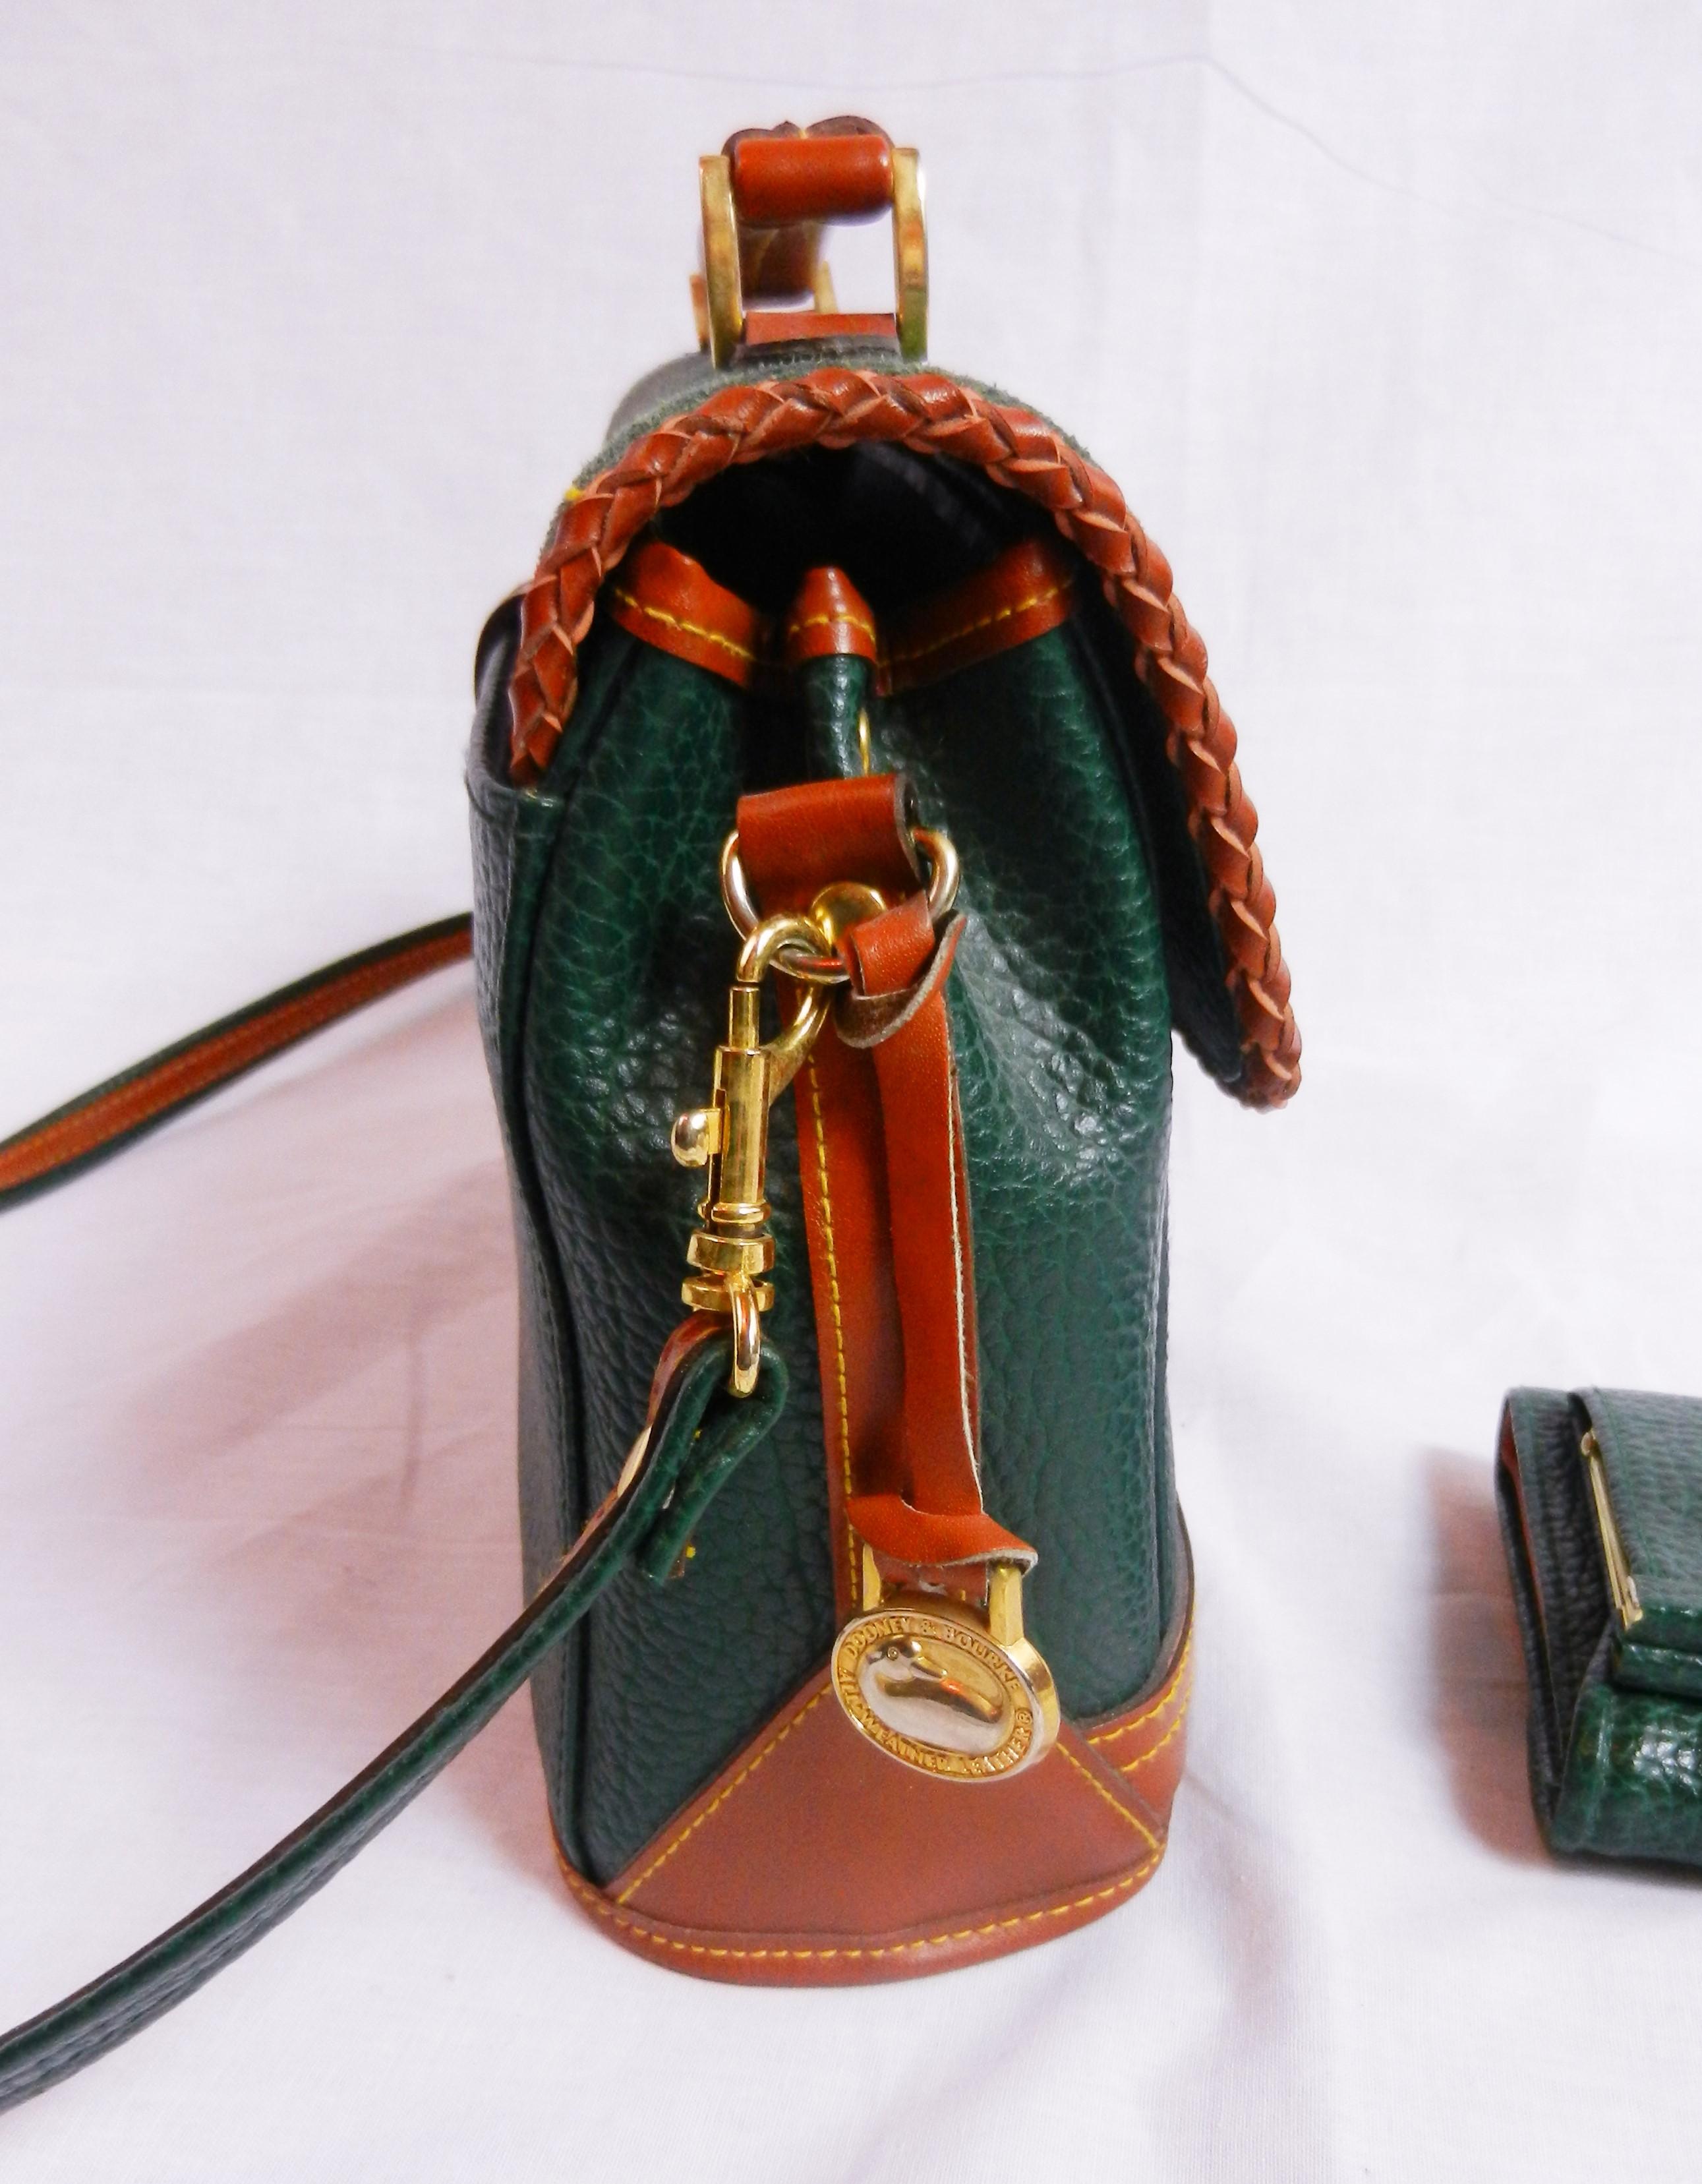 Fake Handbag Vintage Dooney Bourke